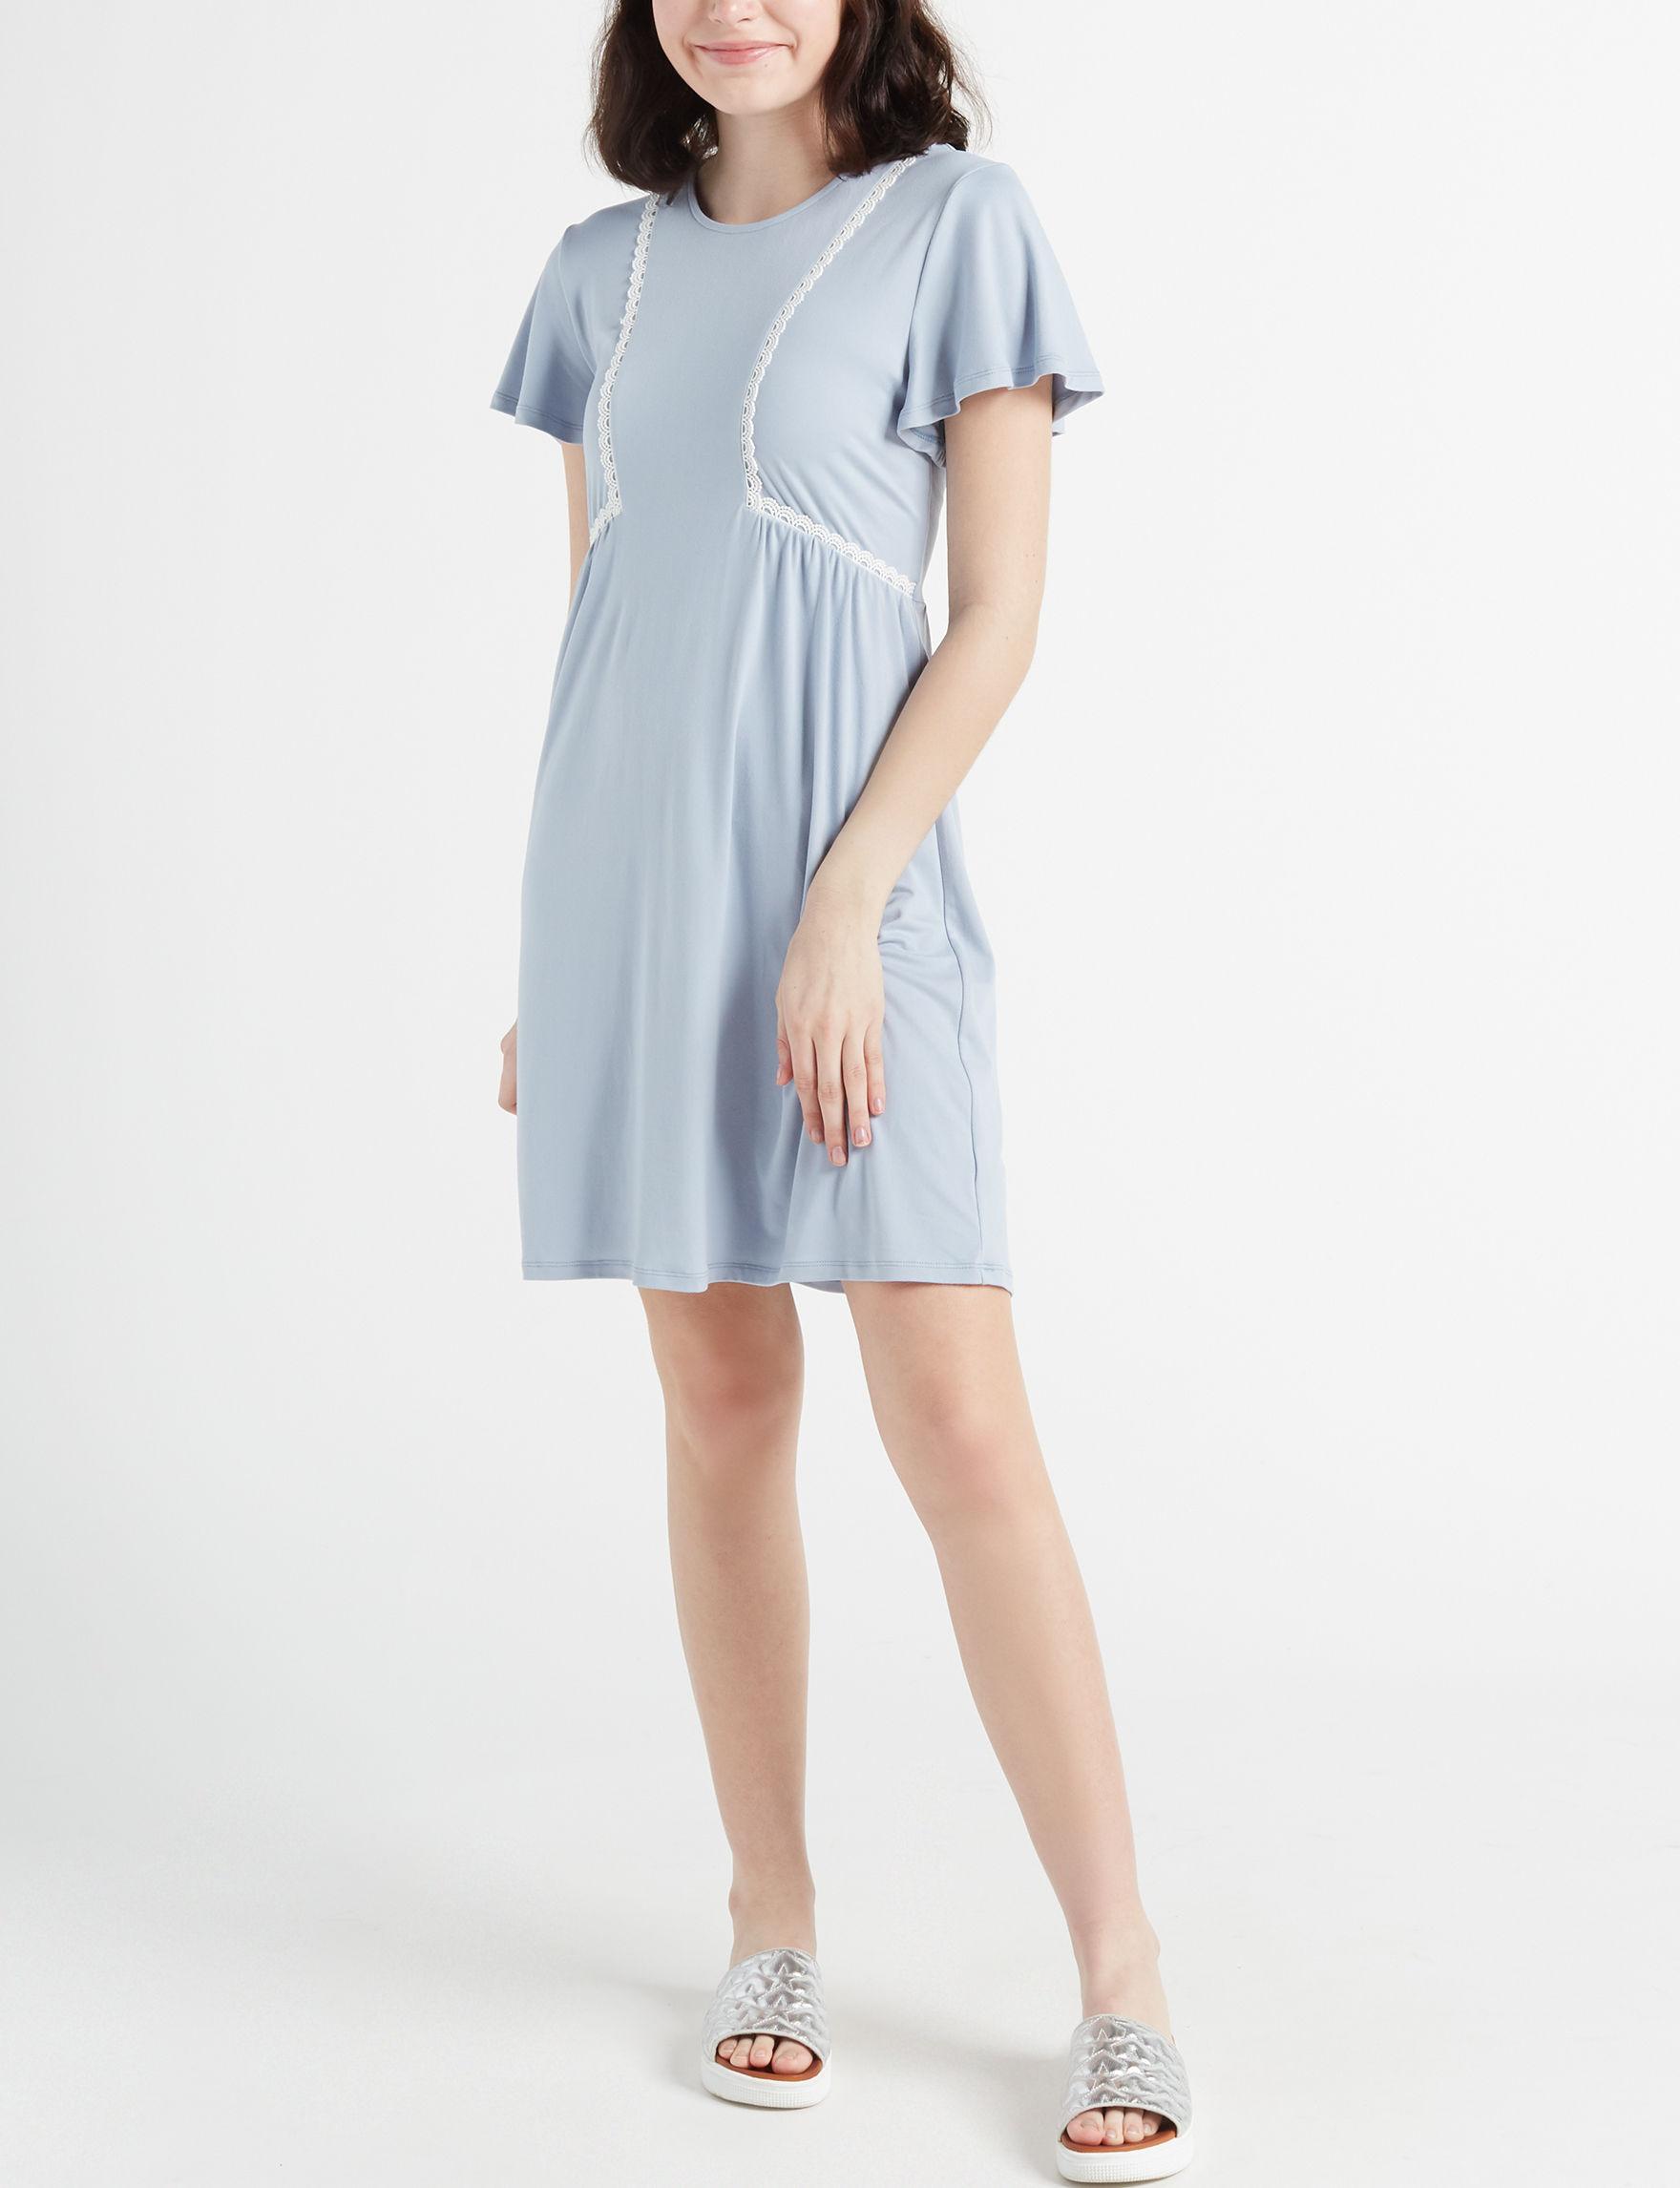 Trixxi Blue Everyday & Casual Shift Dresses